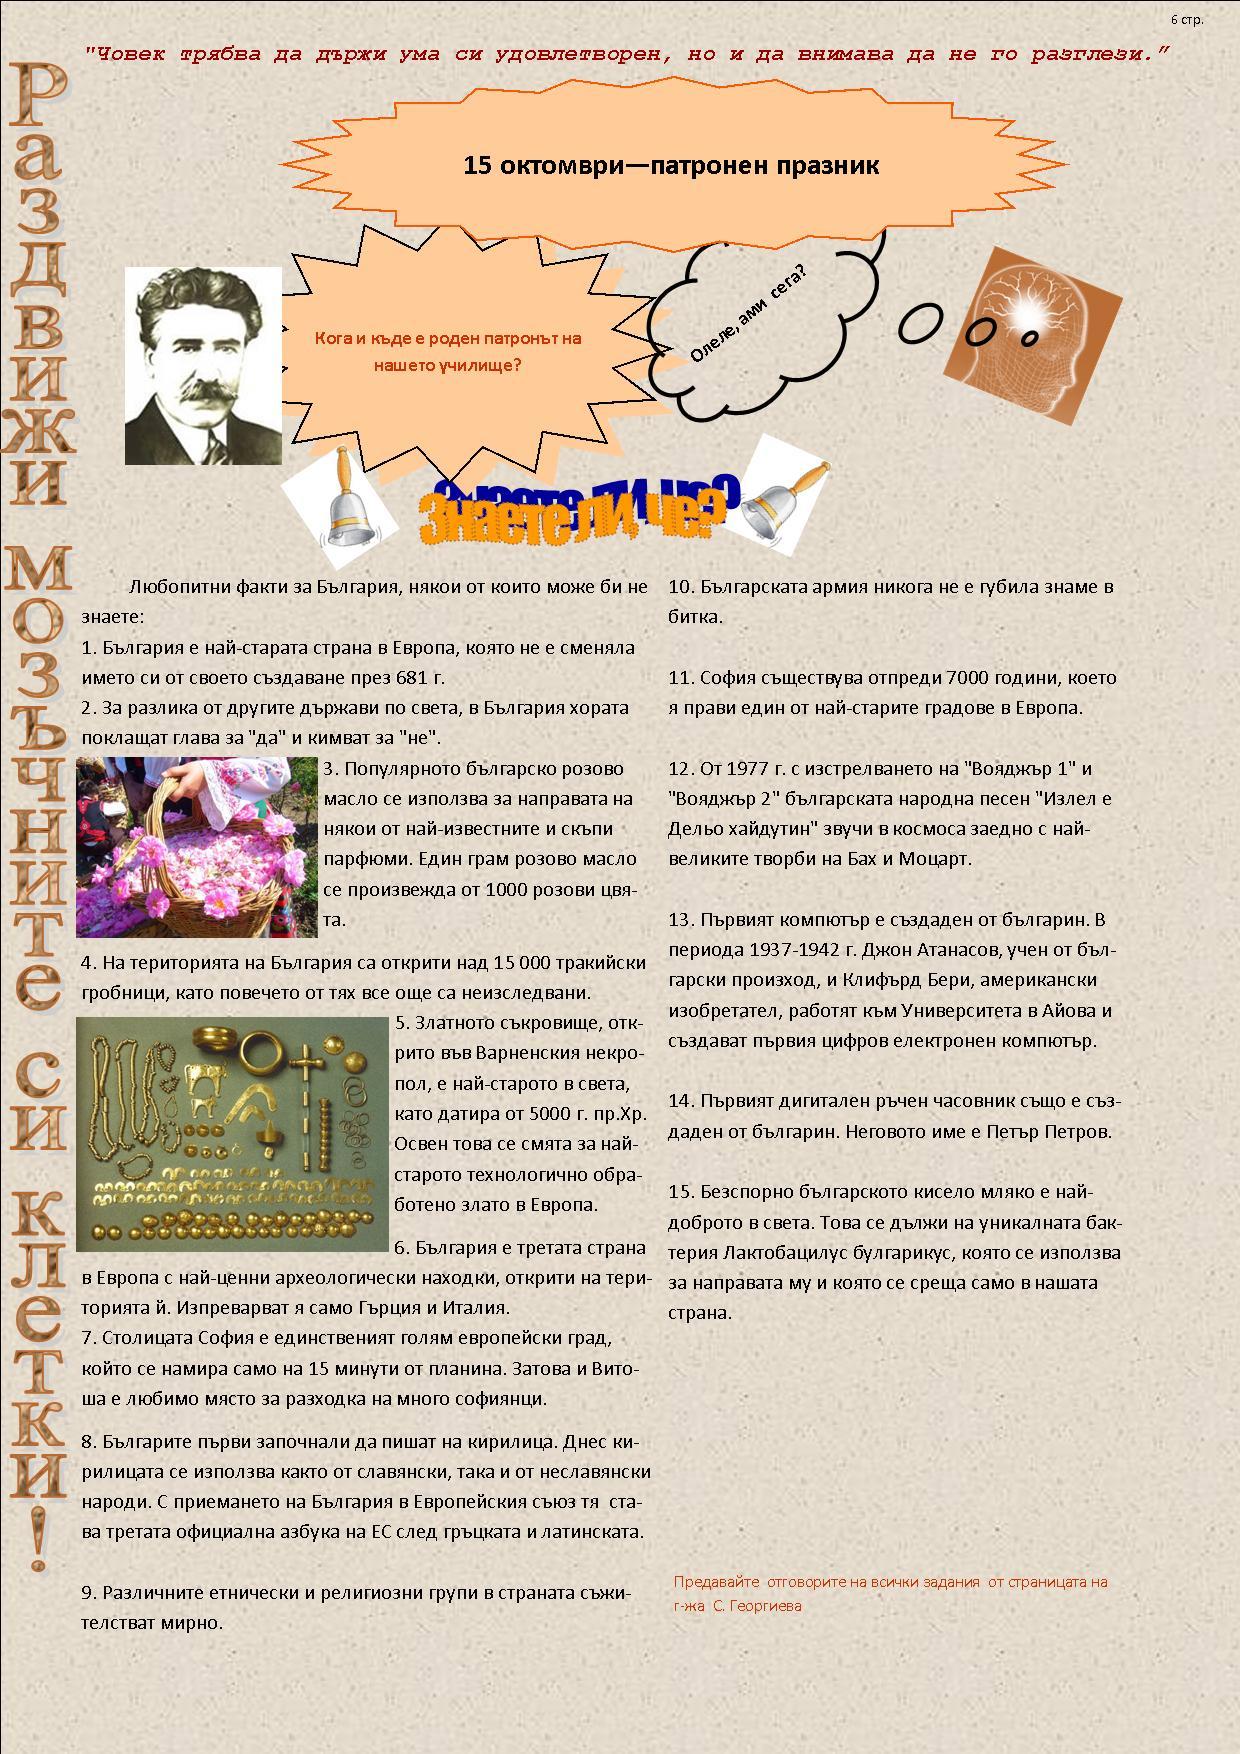 1вестник-10-ти бр-октомври-стр 6 за 2013